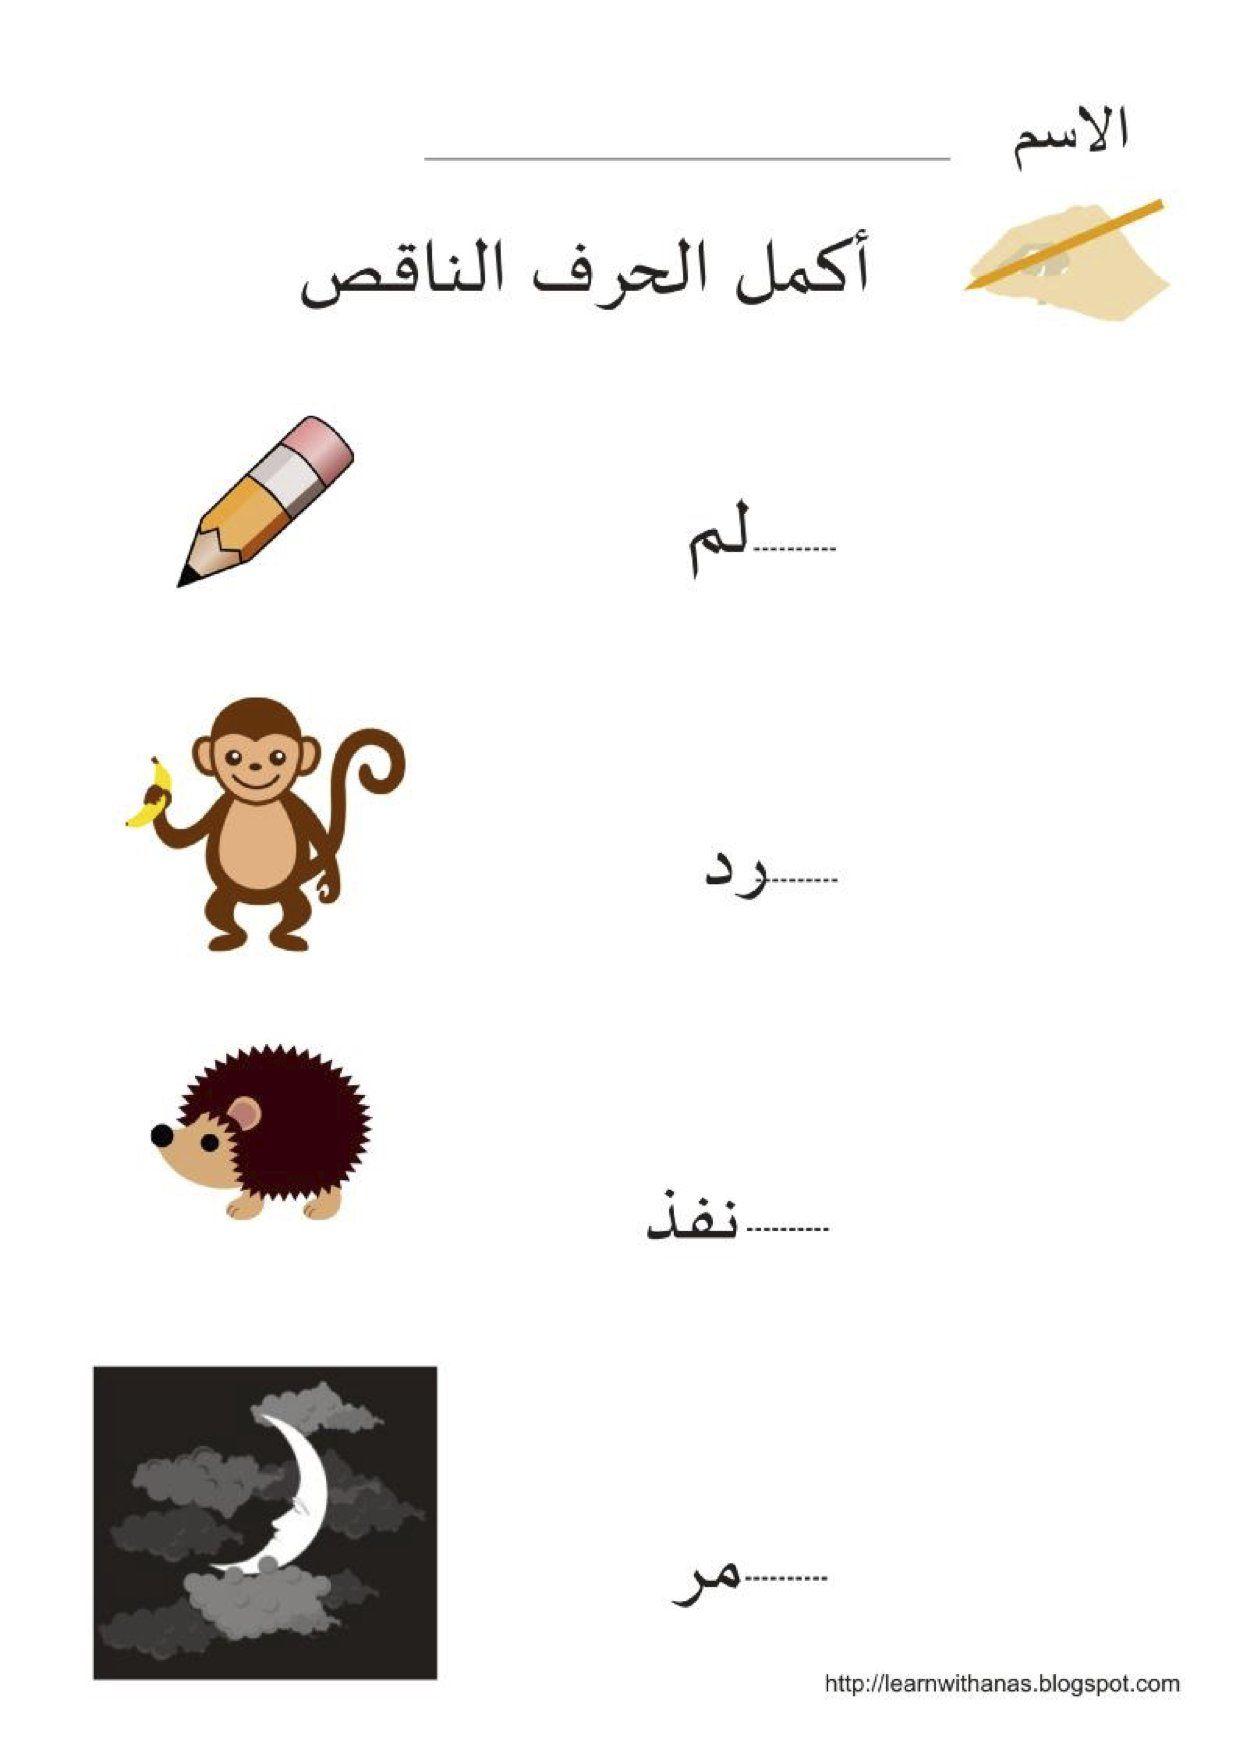 Twitter Arabic Kids Arabic Alphabet For Kids Arabic Alphabet [ 1754 x 1239 Pixel ]